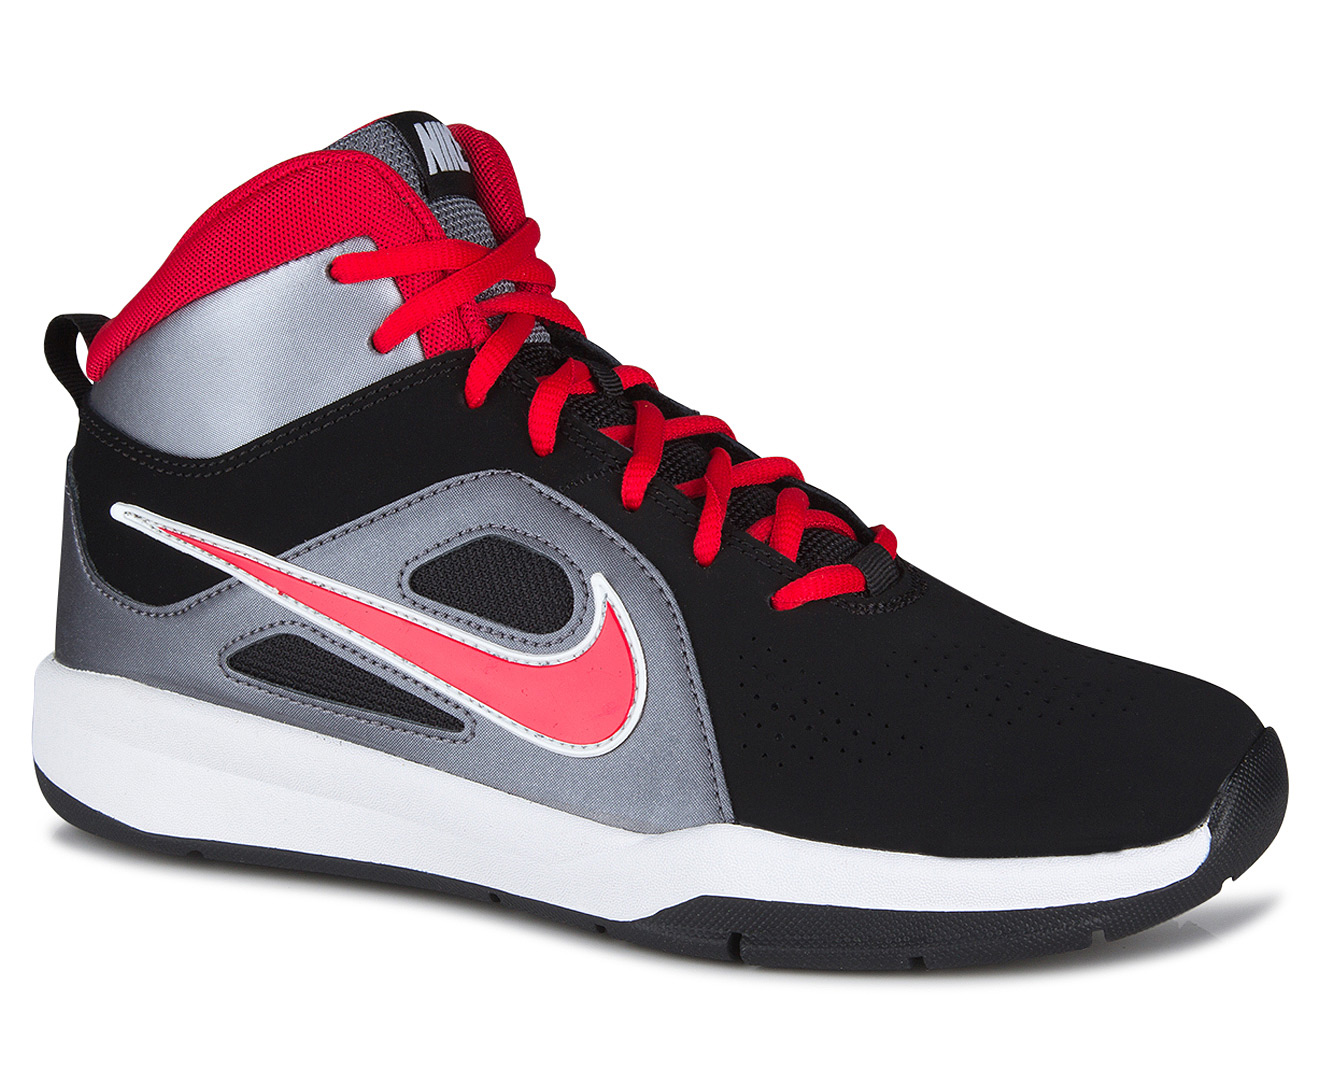 hot sale online 34852 5ed46 Nike Grade-School Kids  Team Hustle D6 (GS) Shoe - Black University Red  Metallic Cool Grey White   Catch.com.au